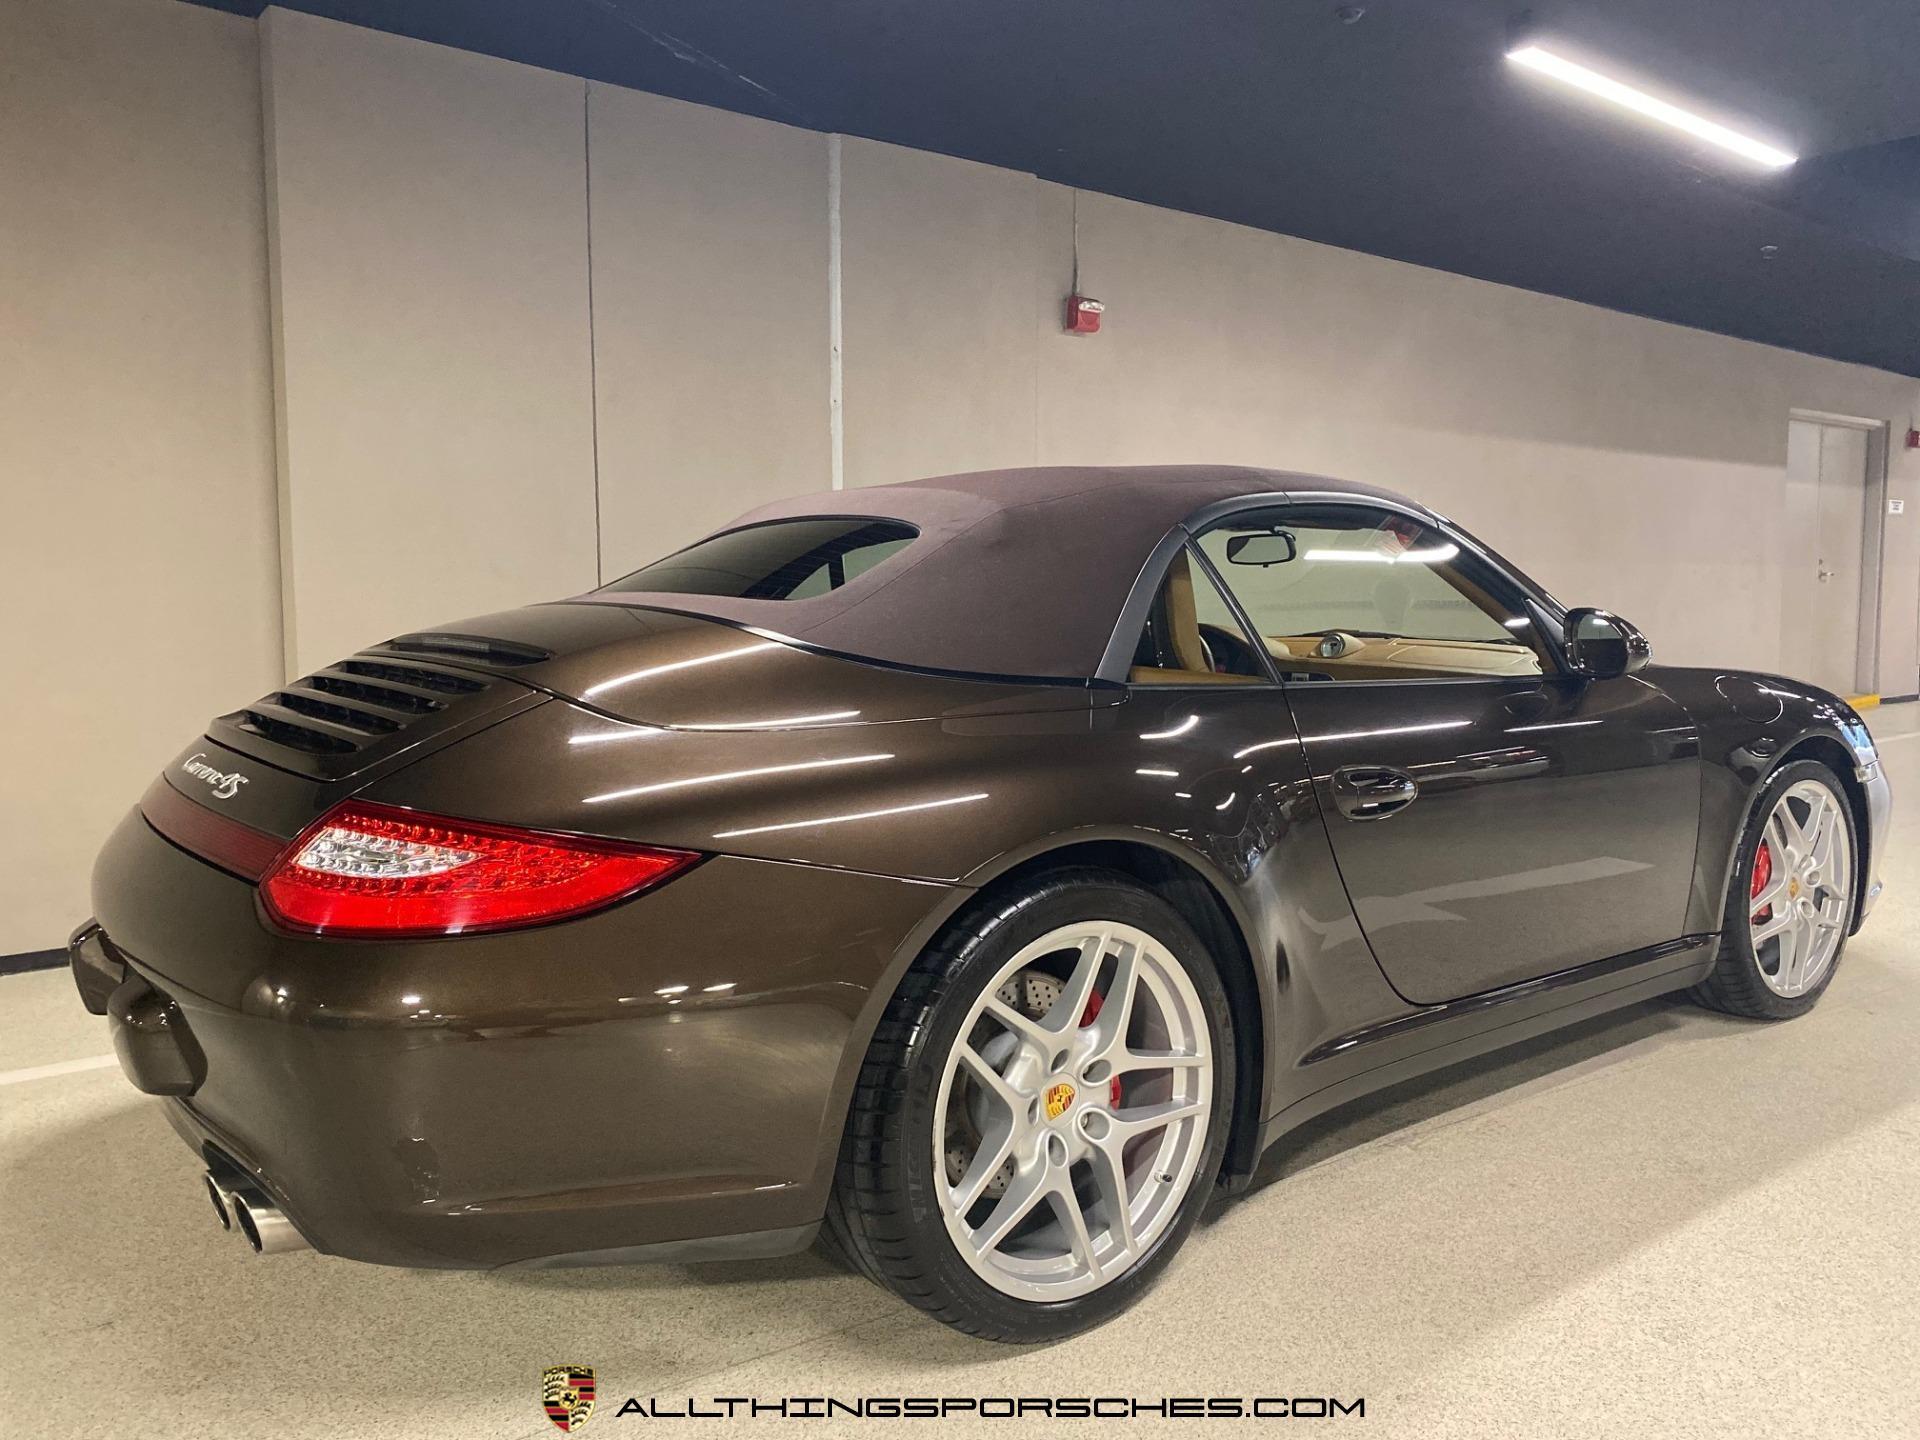 Used-2009-Porsche-911-Carrera-4S-Cabriolet-Manual-Trans